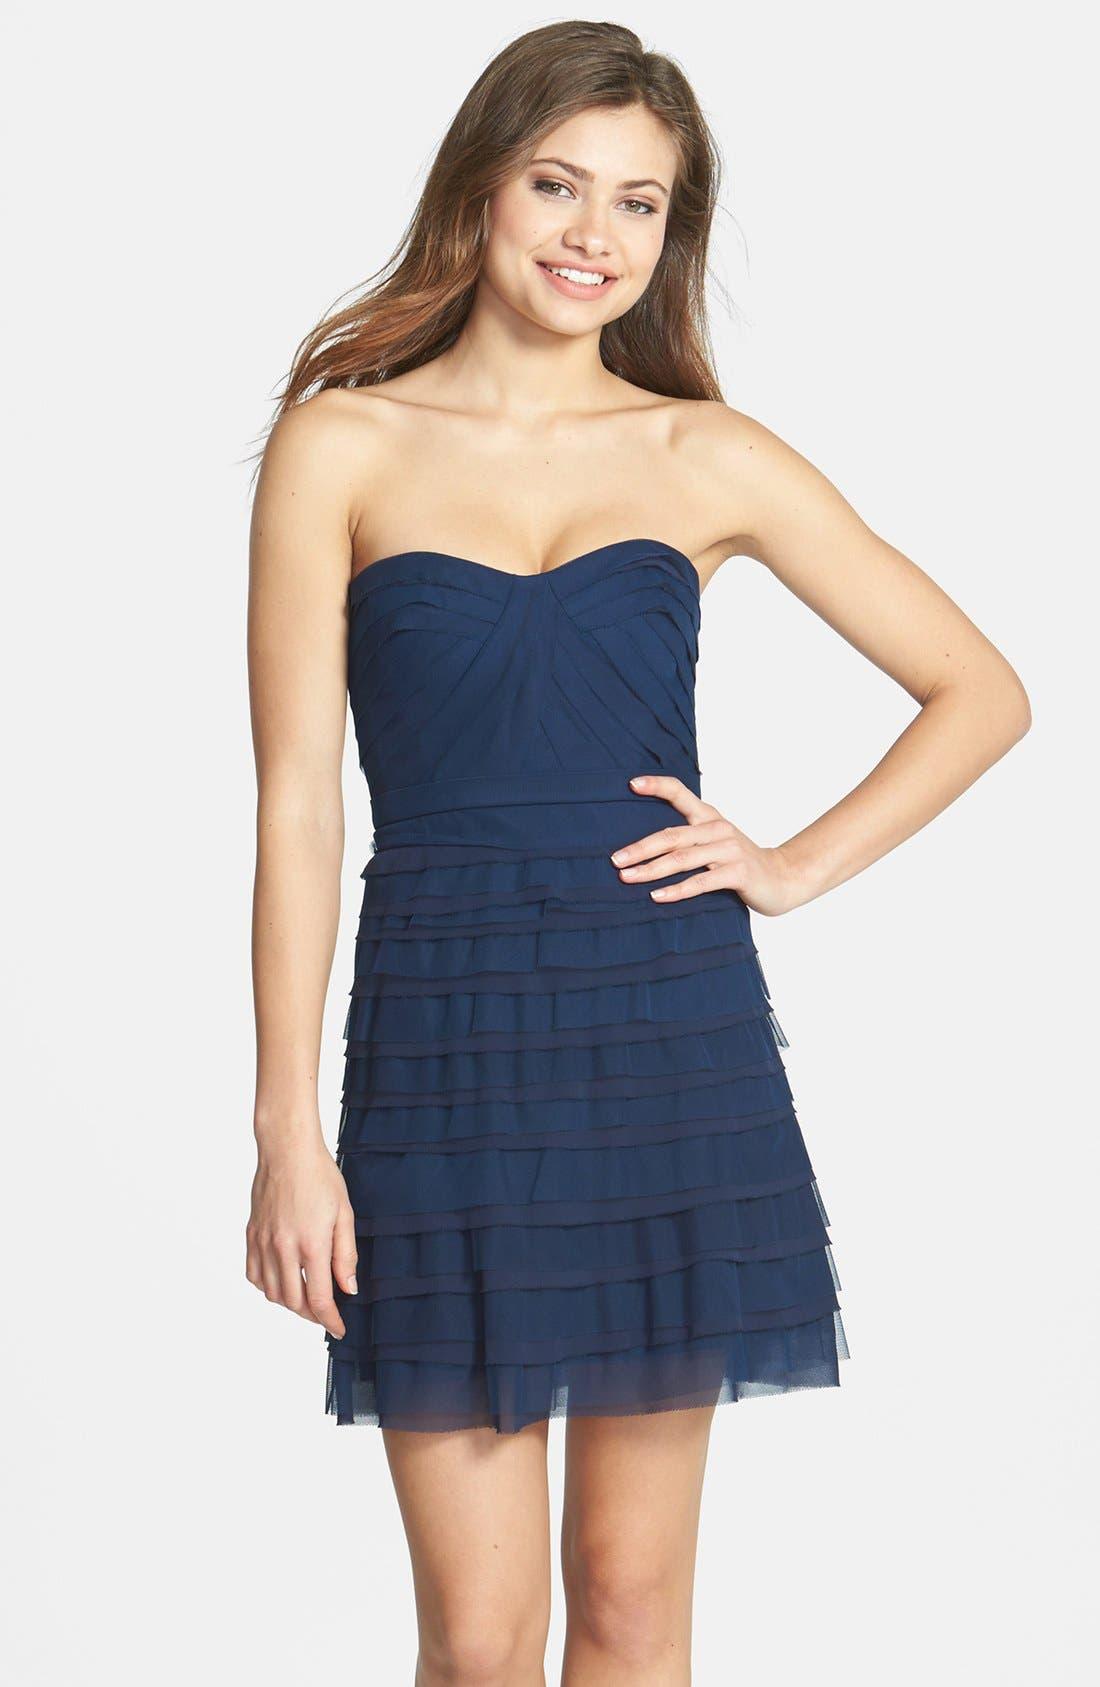 Alternate Image 1 Selected - BCBGMAXAZRIA 'Cocco' Tiered Chiffon Dress